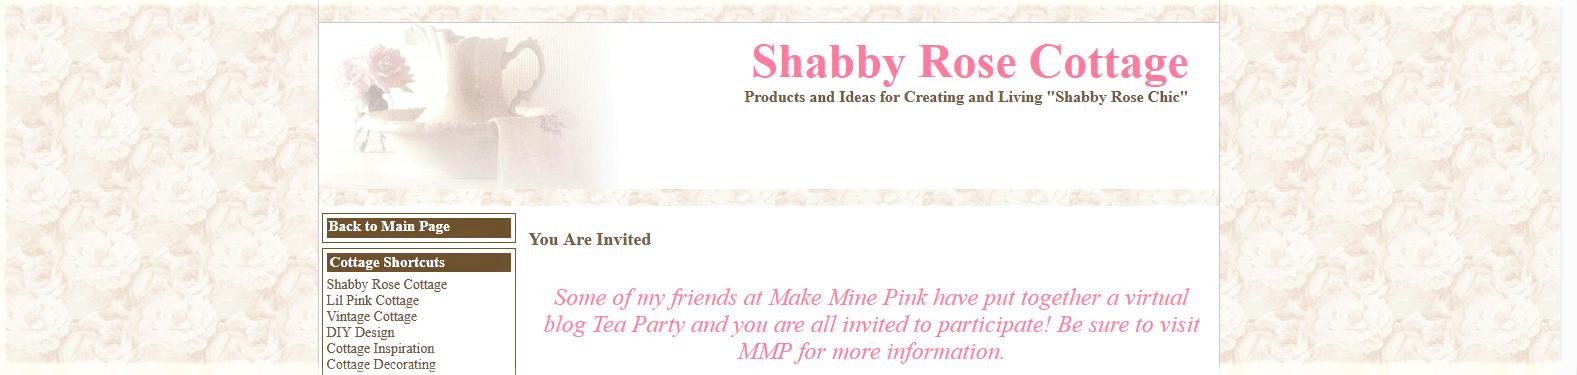 Shabby Rose Cottage Blog Shot